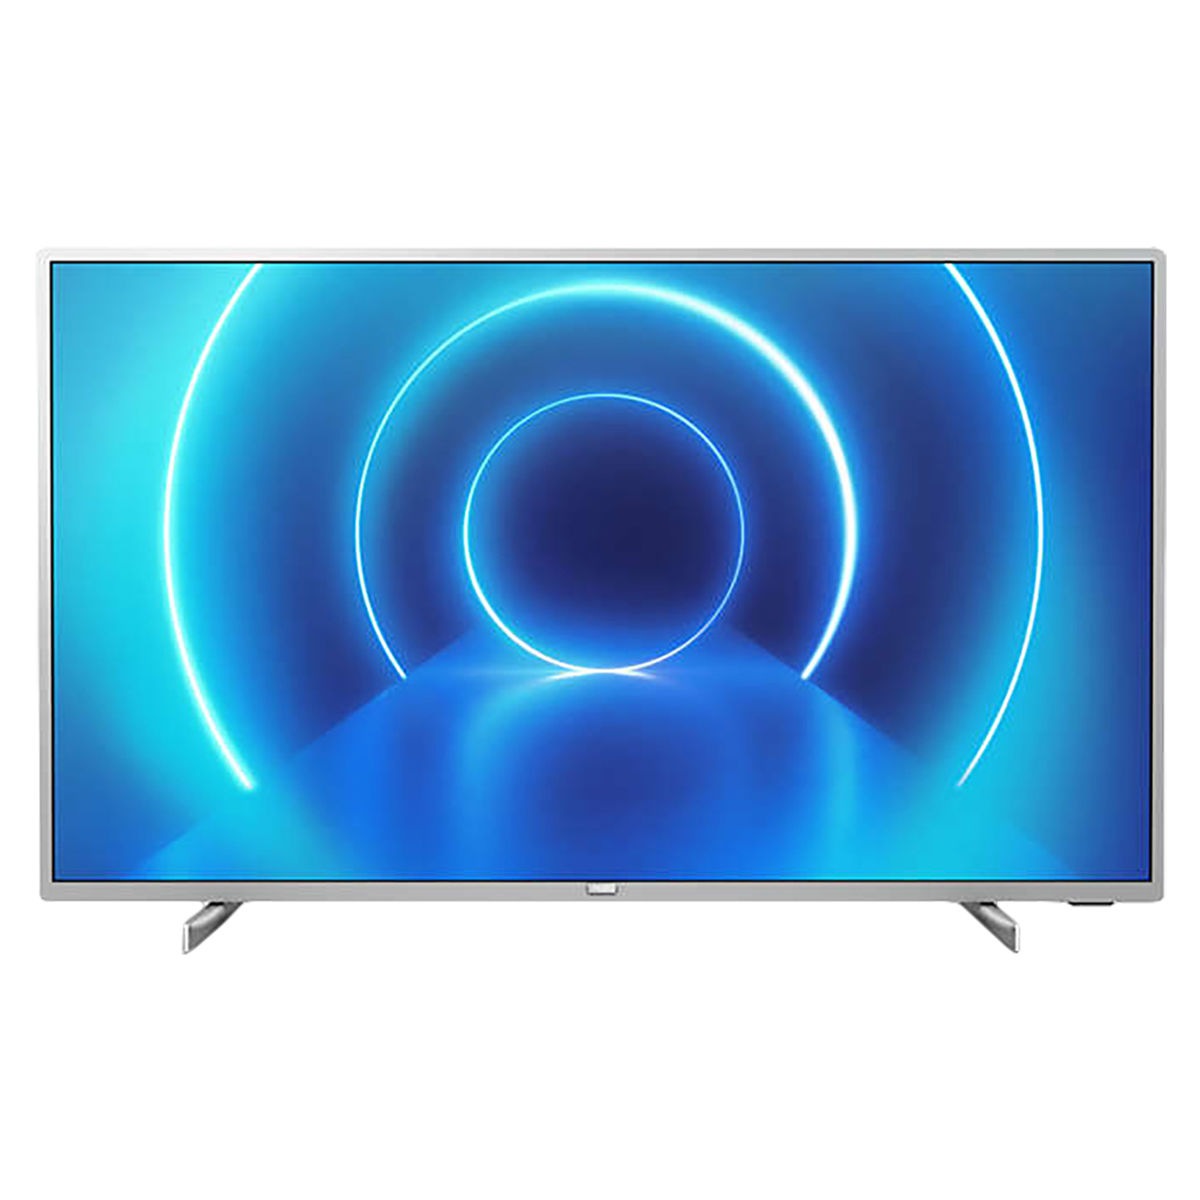 TV LED - Smart Tv - 60'' - 70PUS7555 - Silver